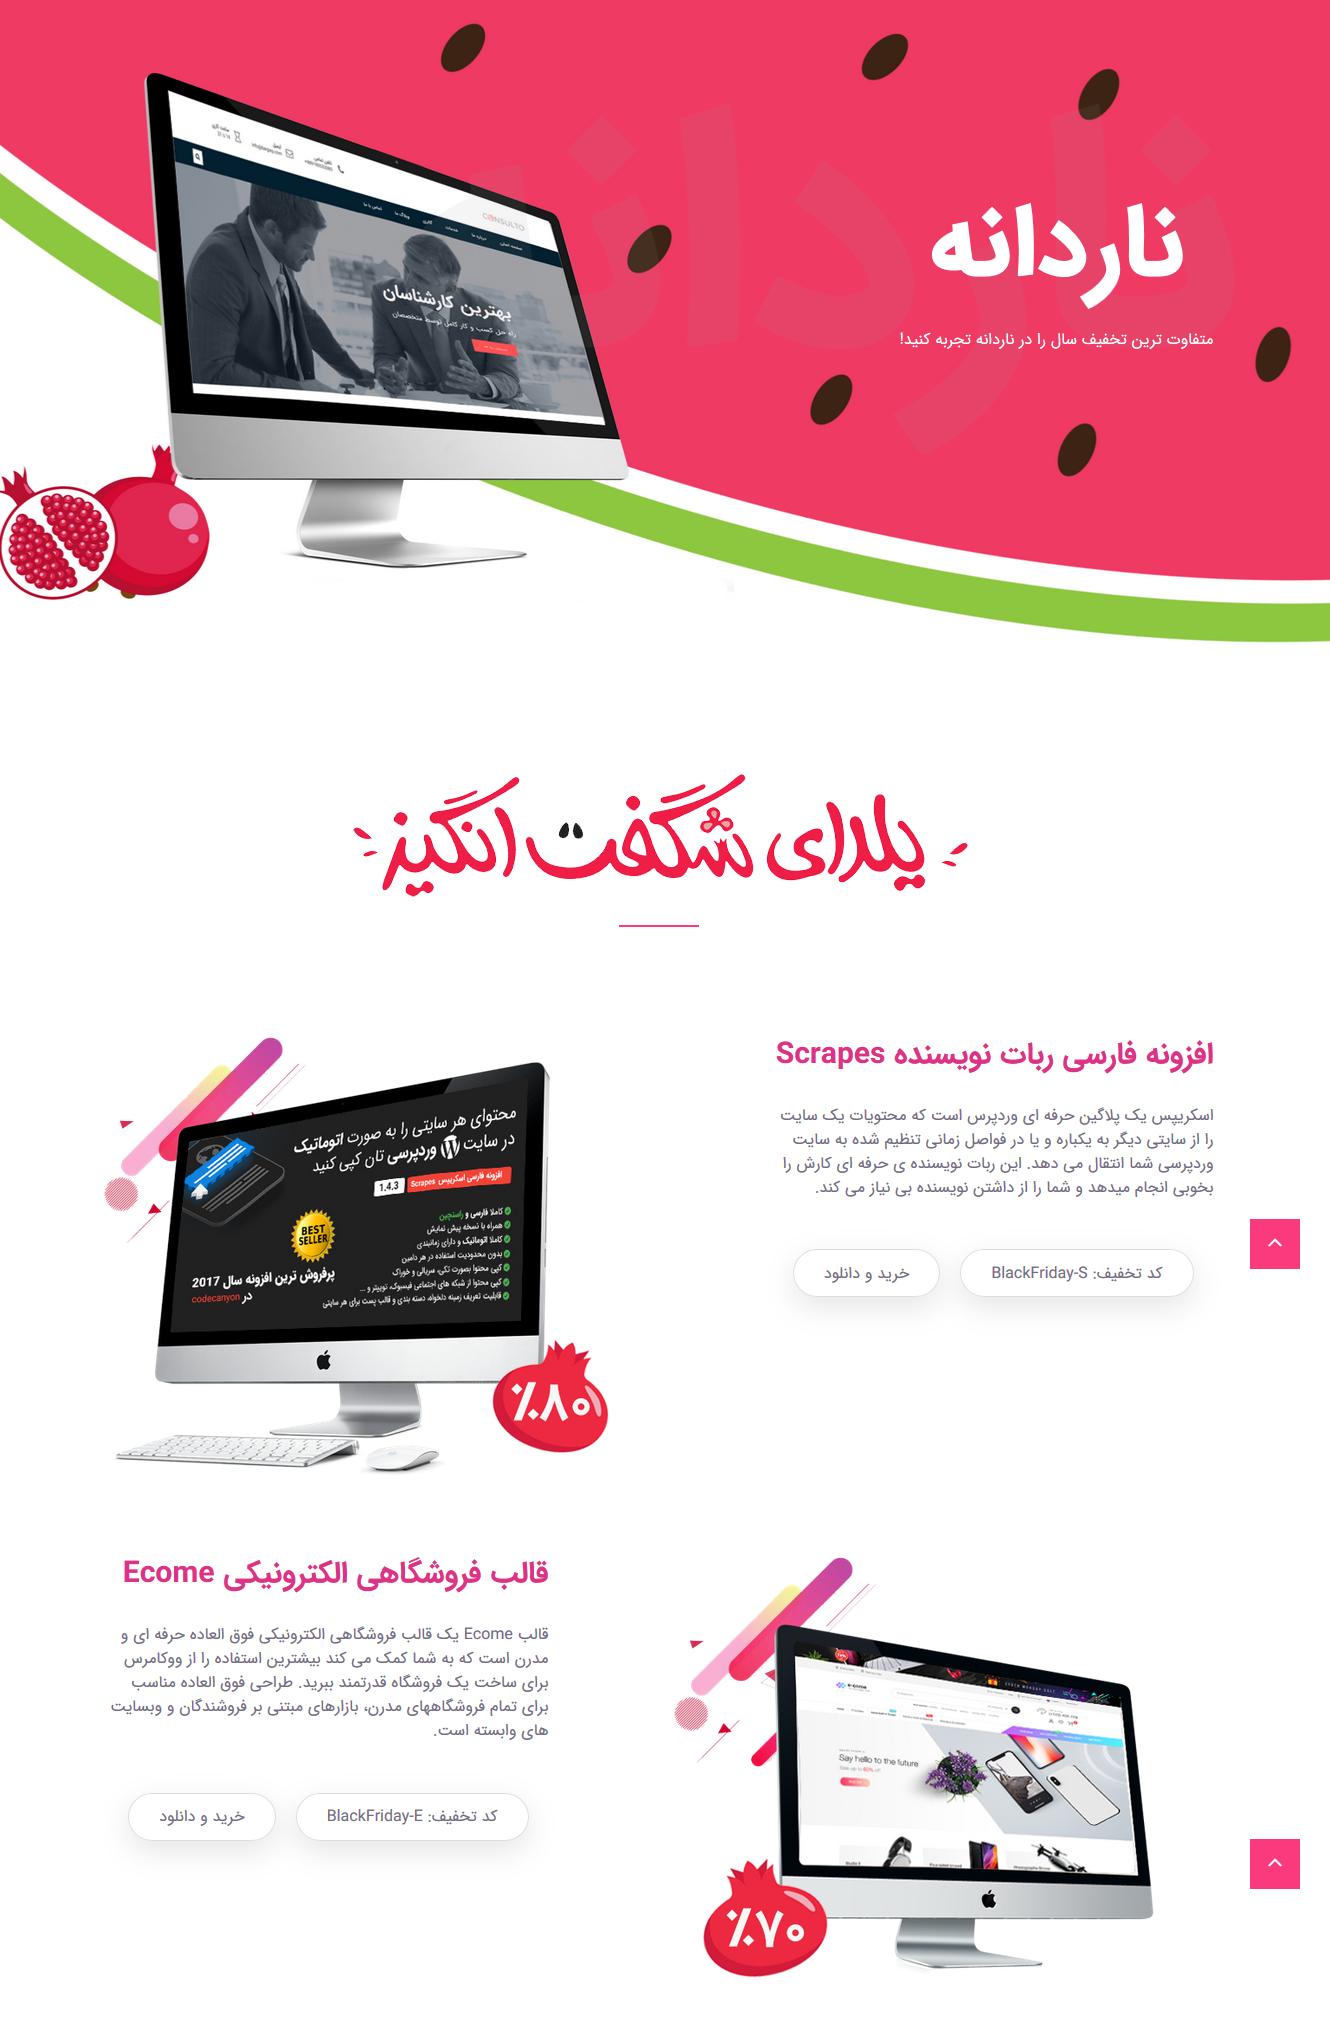 قالب HTML لندینگ پیج ناردانه به مناسبت جشنواره یلدا